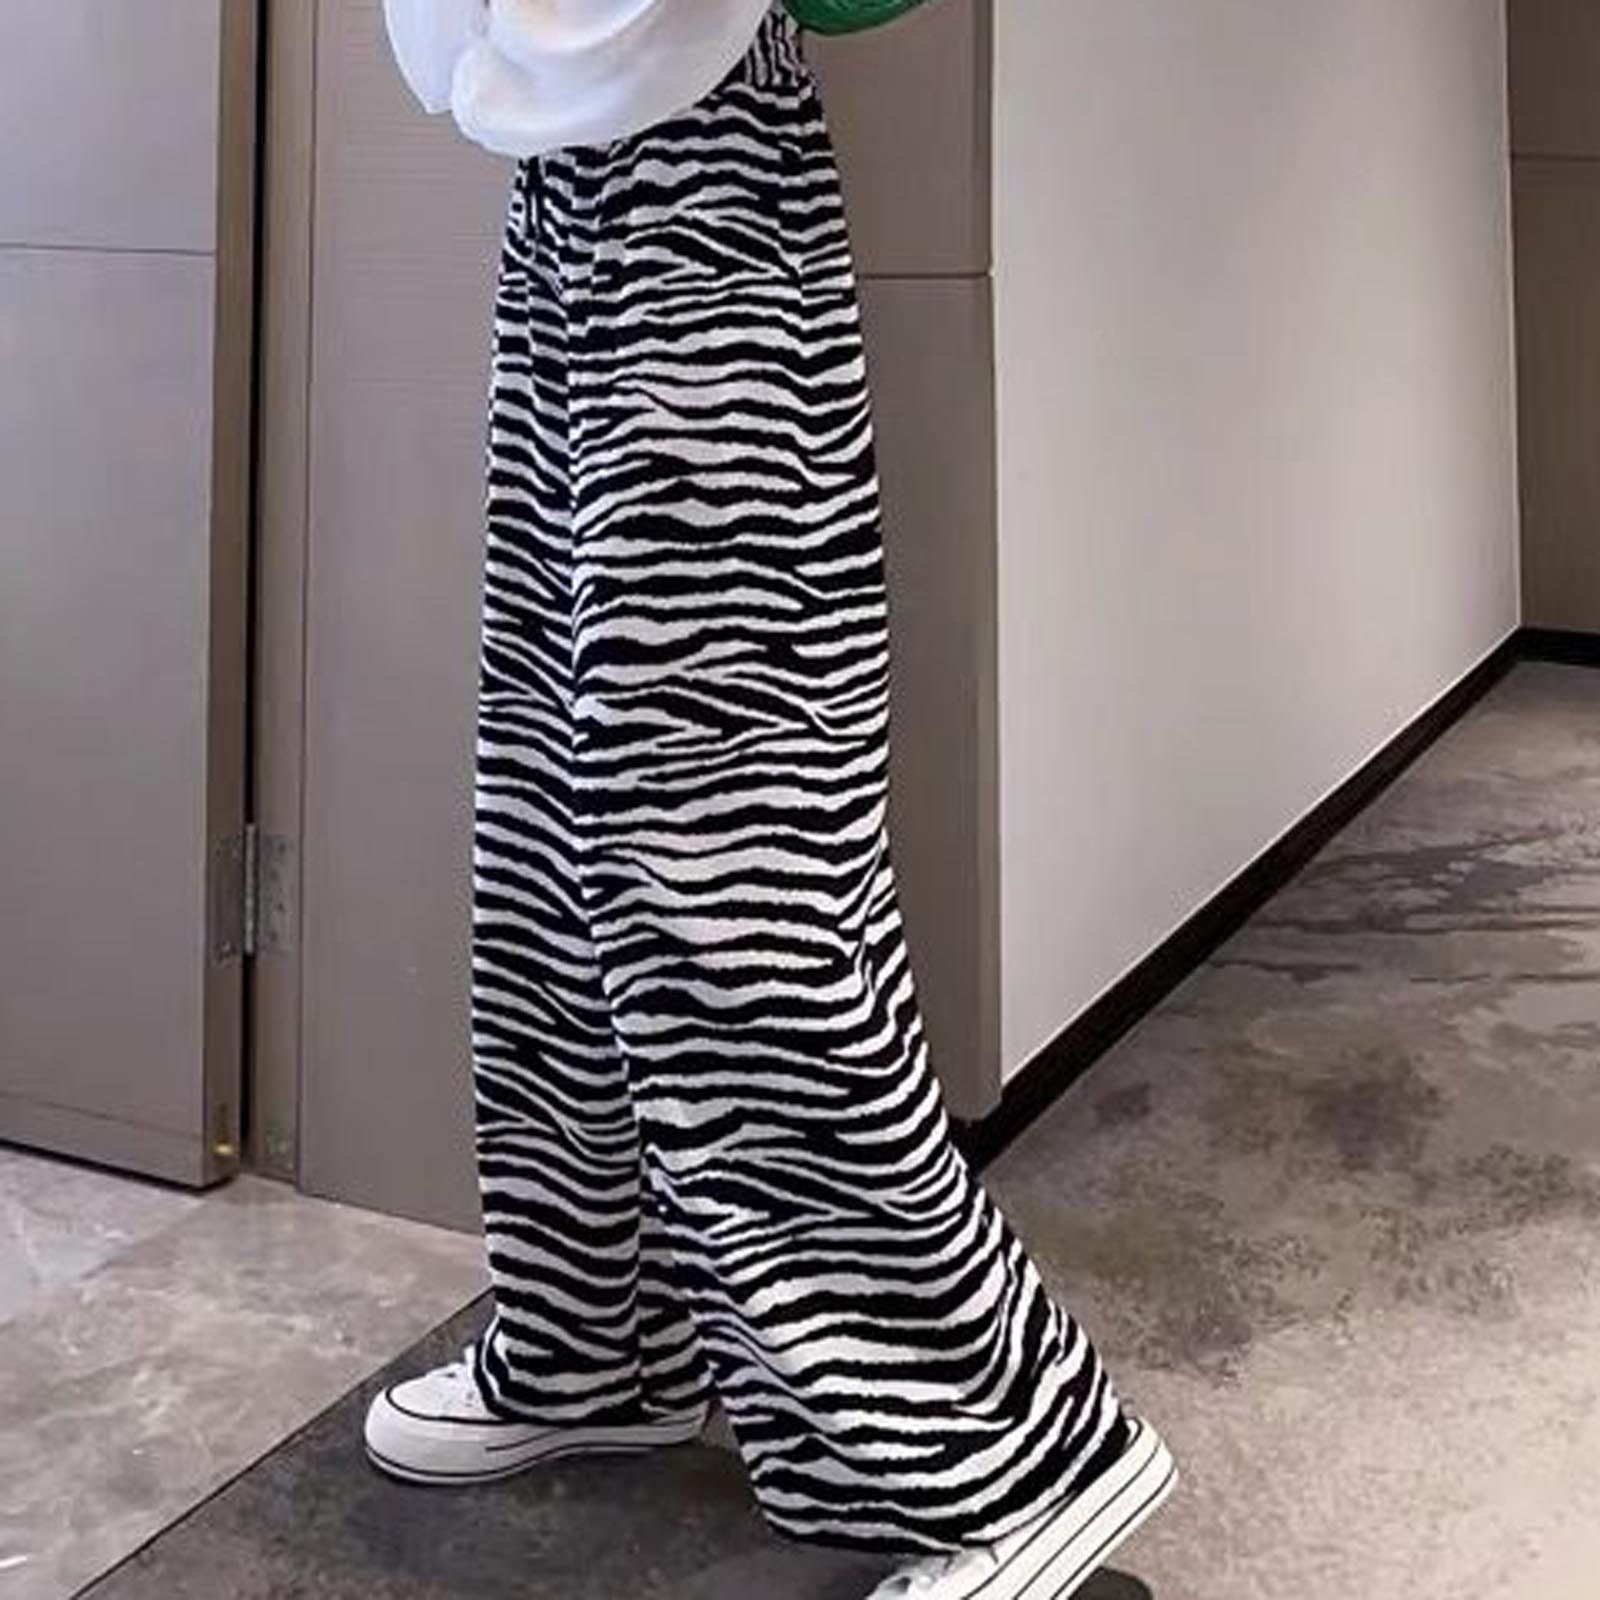 Women Zebra Pattern Wide-leg Pants Pantsfashion Striped Loose High Waist Pants Ladies Adjustable Long Trousers Женские Штаны D31